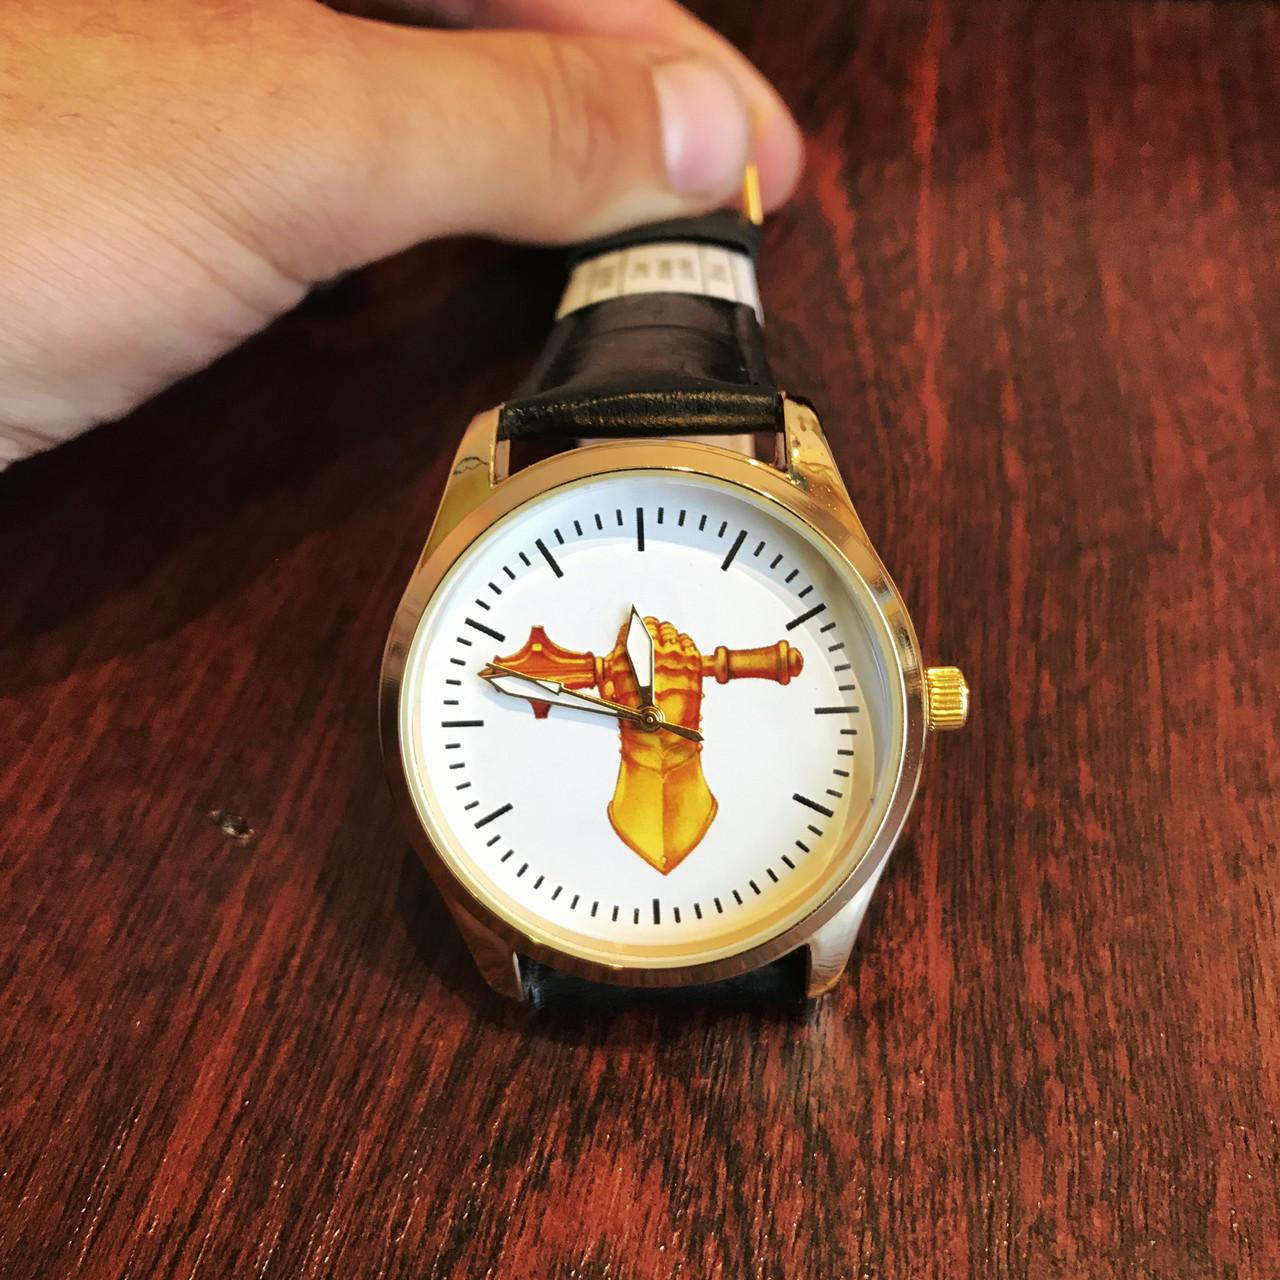 Часы наручные с логотипом Танкові війська України